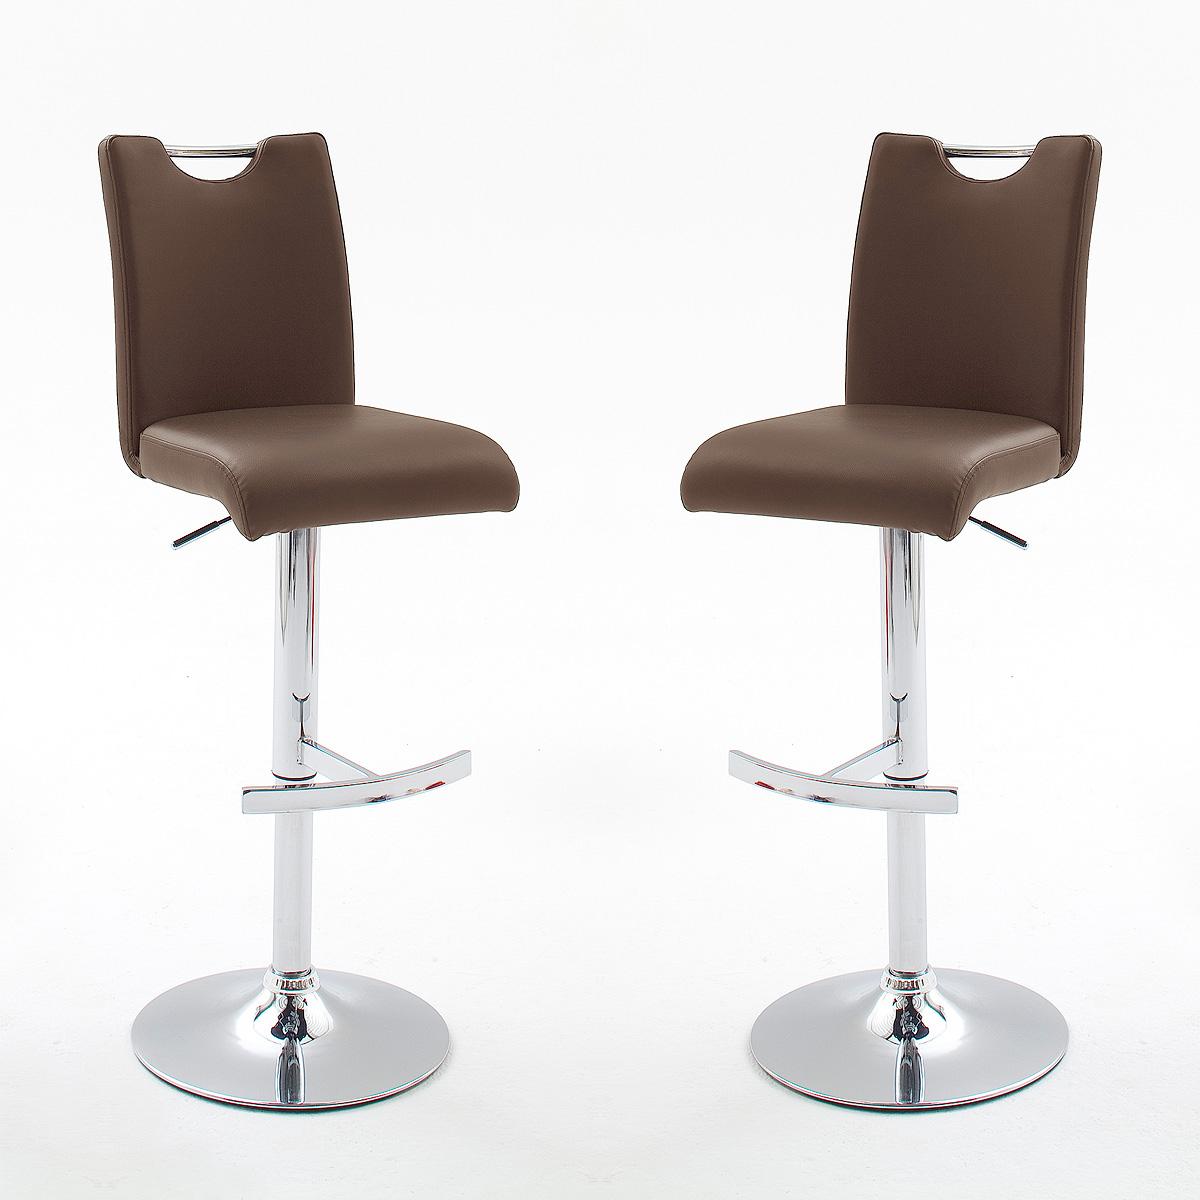 2er set barhocker aachen hocker braun chrom h henverstellbar ebay. Black Bedroom Furniture Sets. Home Design Ideas